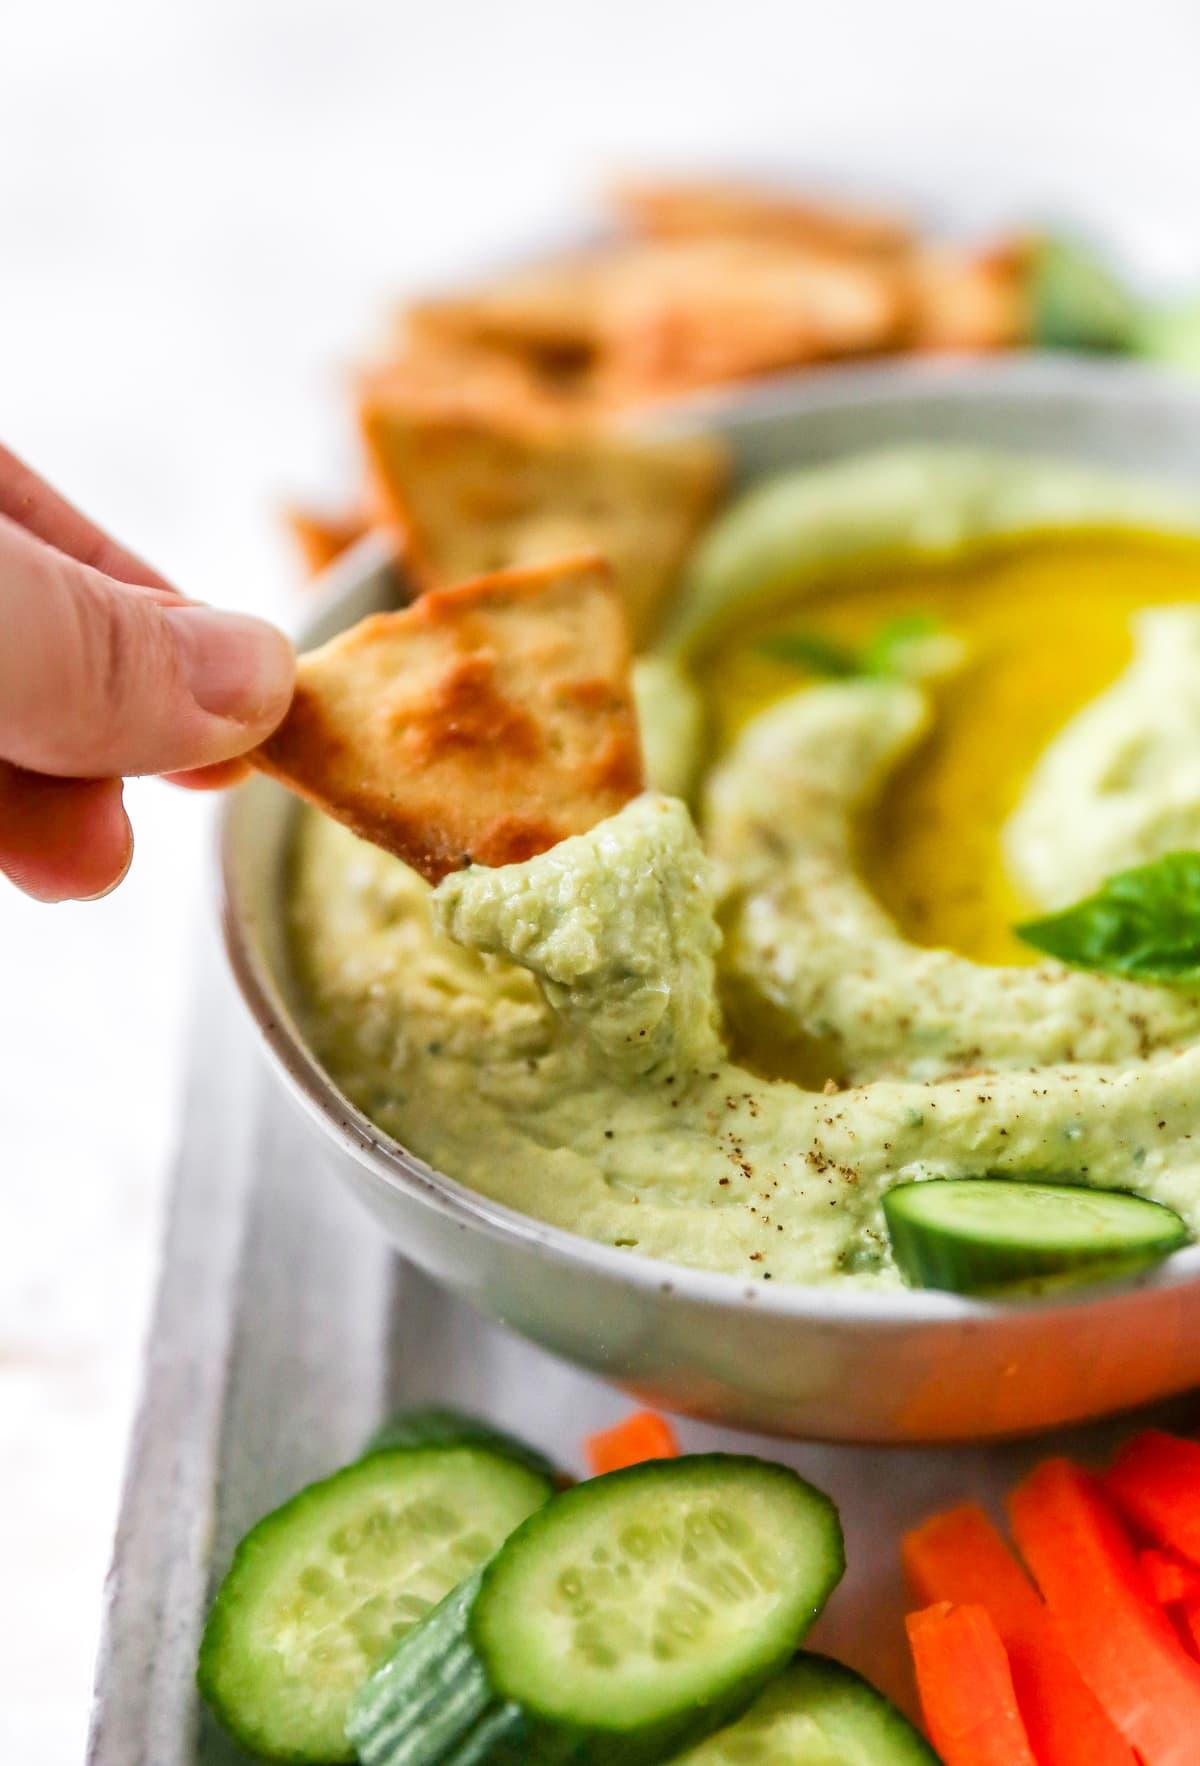 Hand dipping a pita cracker into a bowl of lima bean hummus.